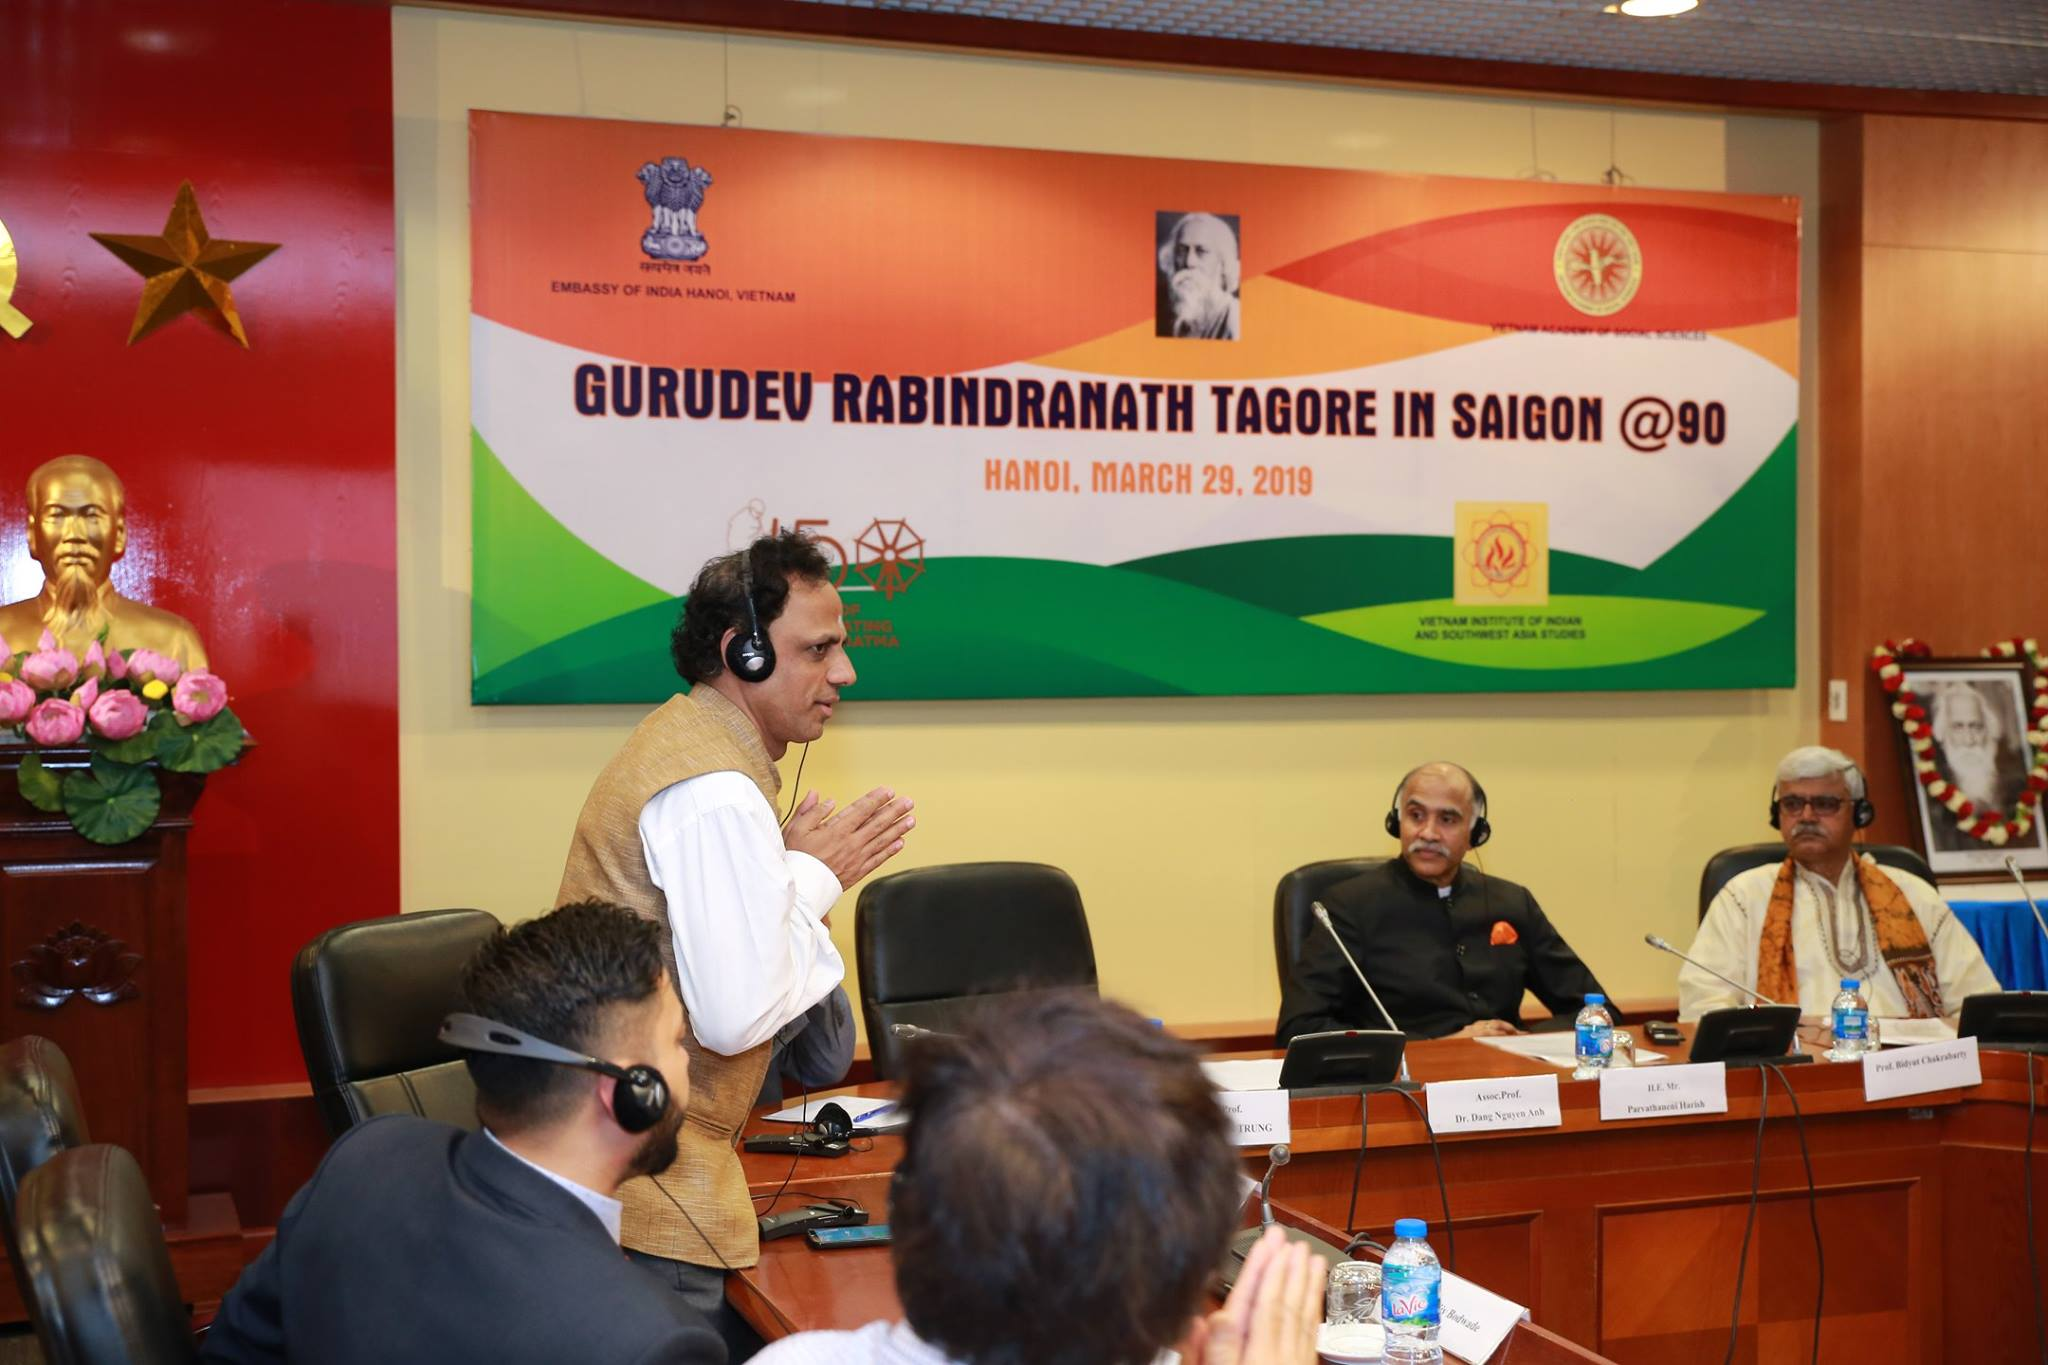 Embassy of India, Hanoi, Vietnam : Events/Photo Gallery